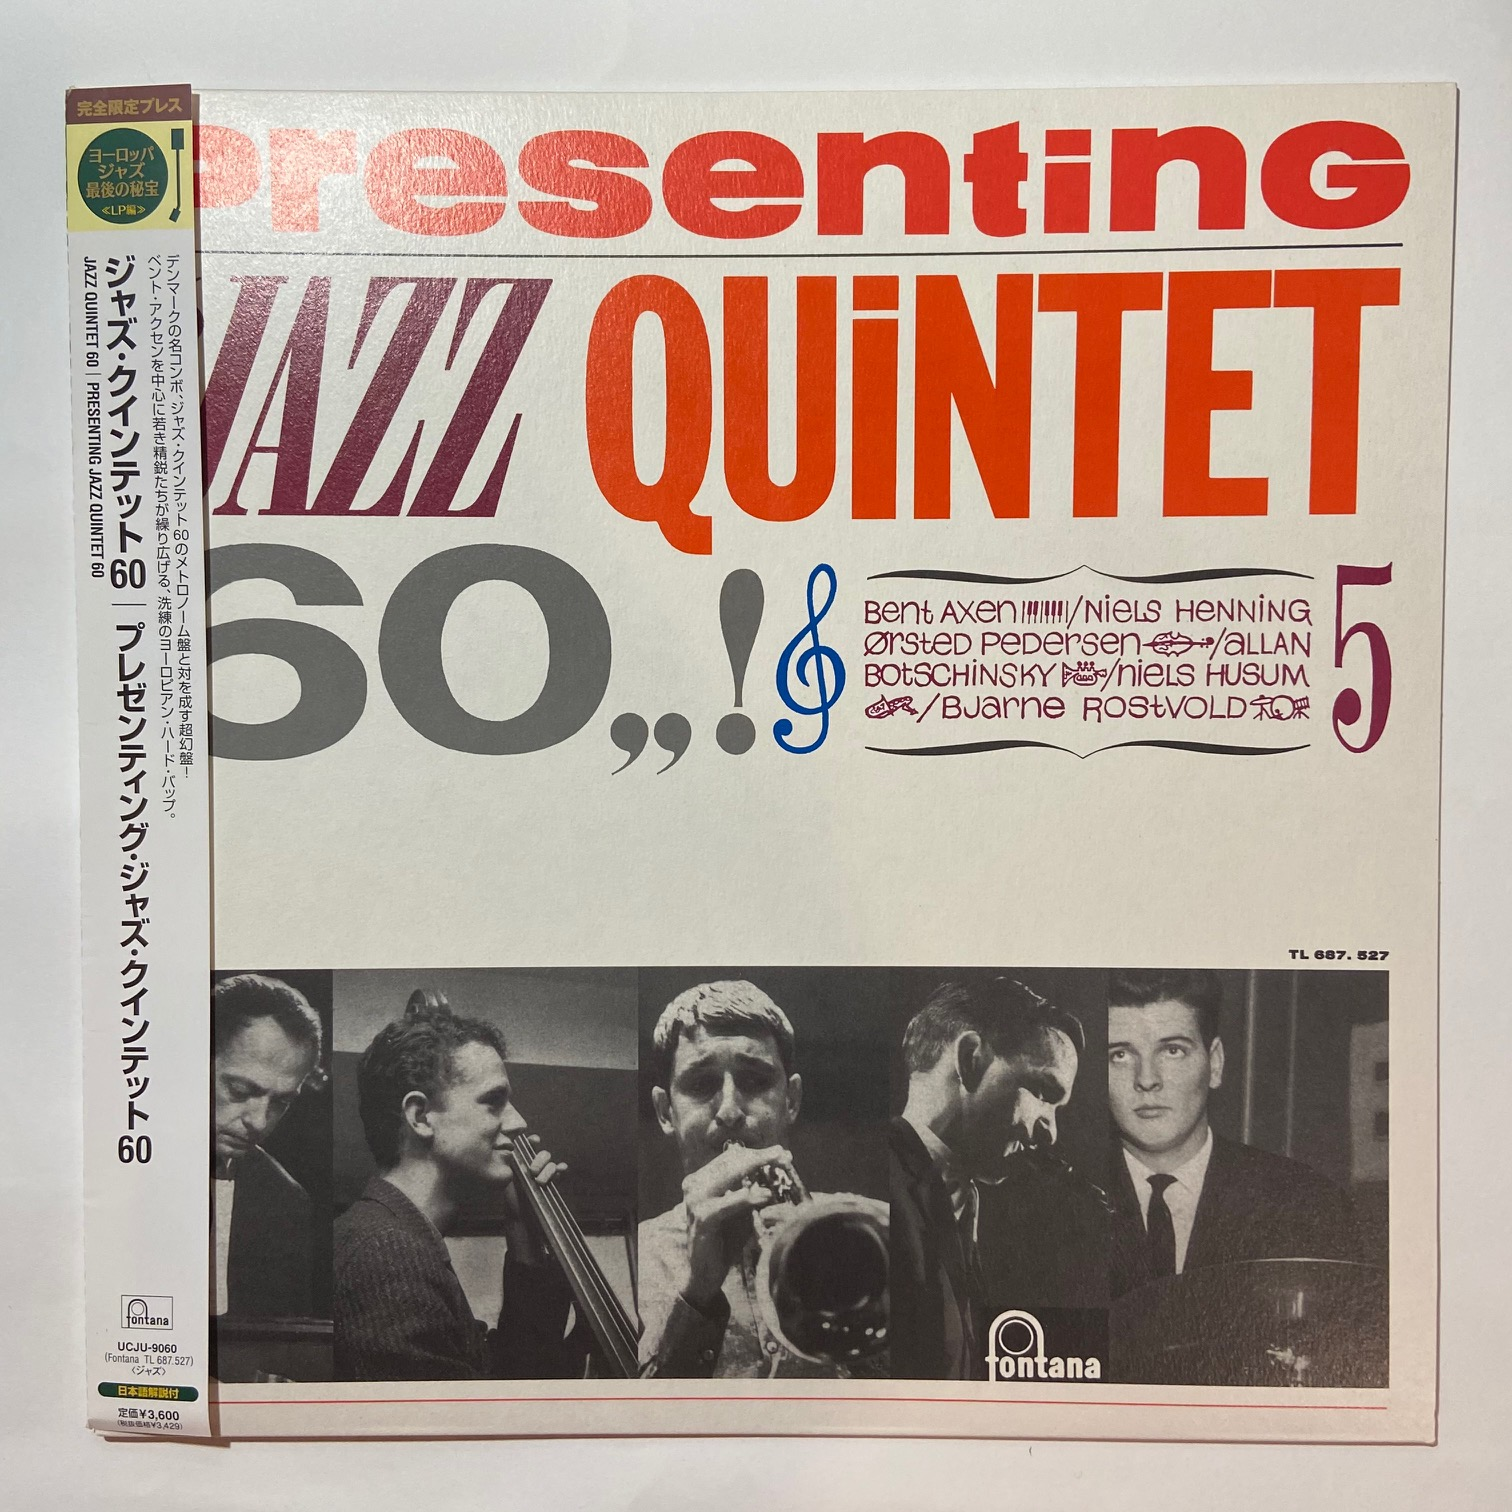 JAZZ QUINTET 60 - Presenting - LP